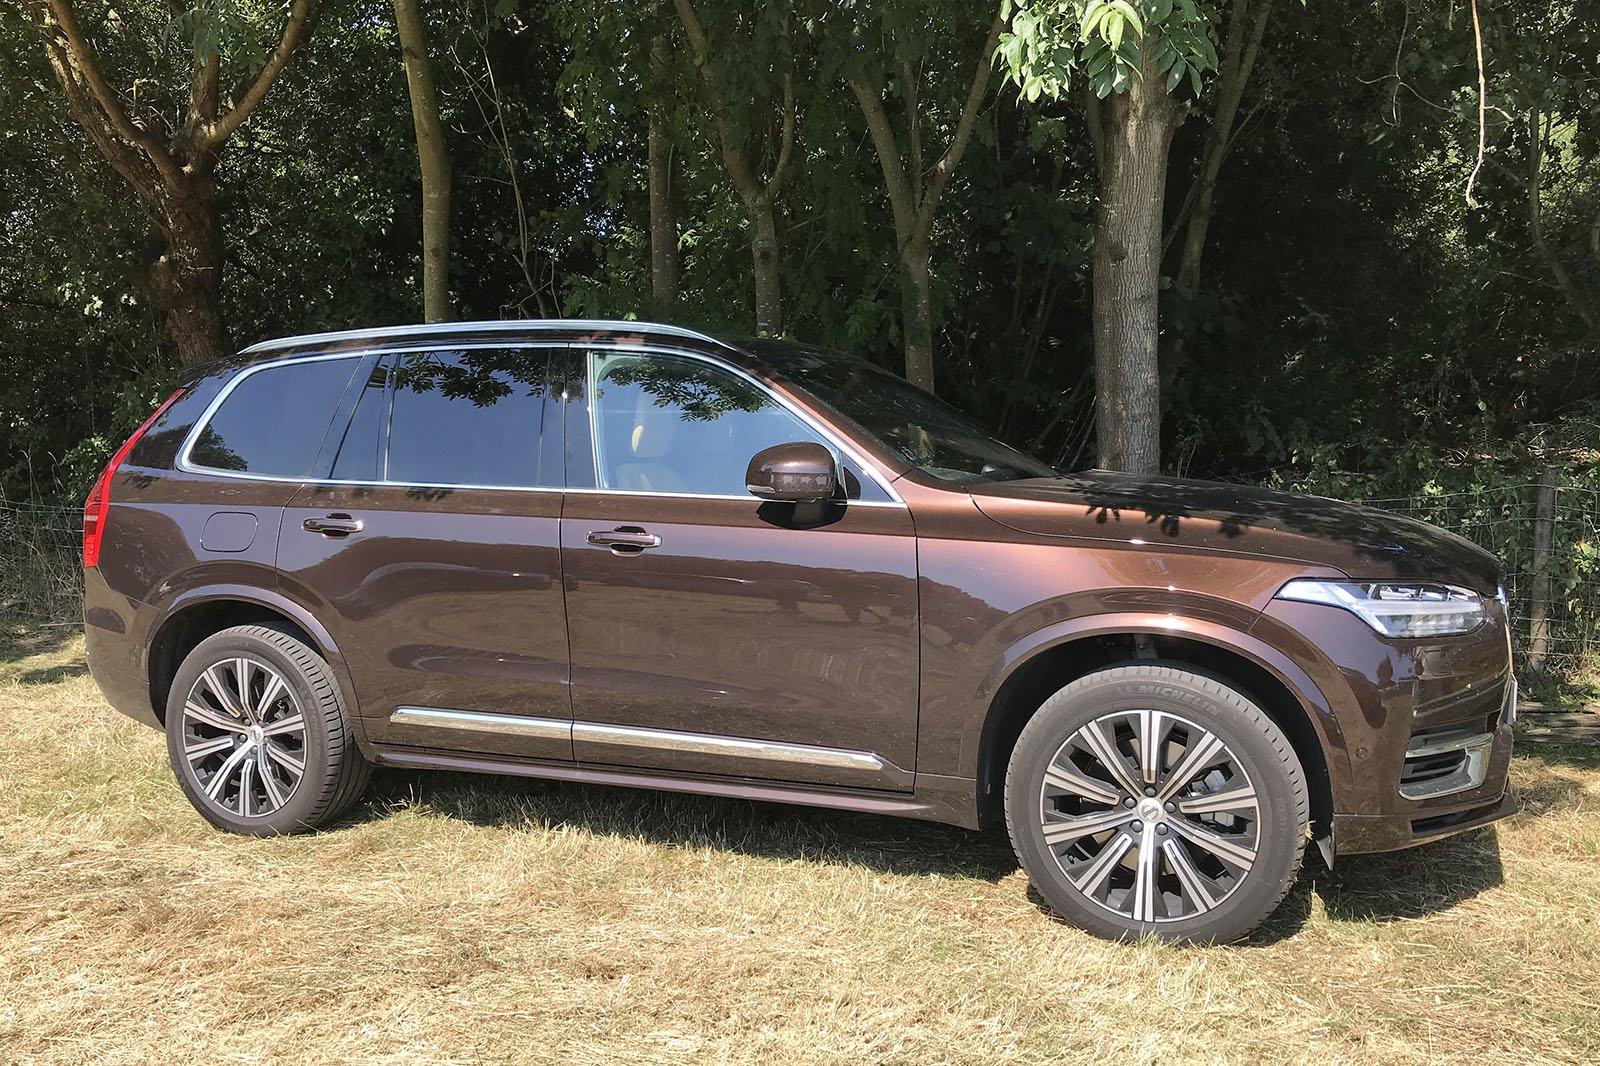 2019 Volvo XC90 LT super brown